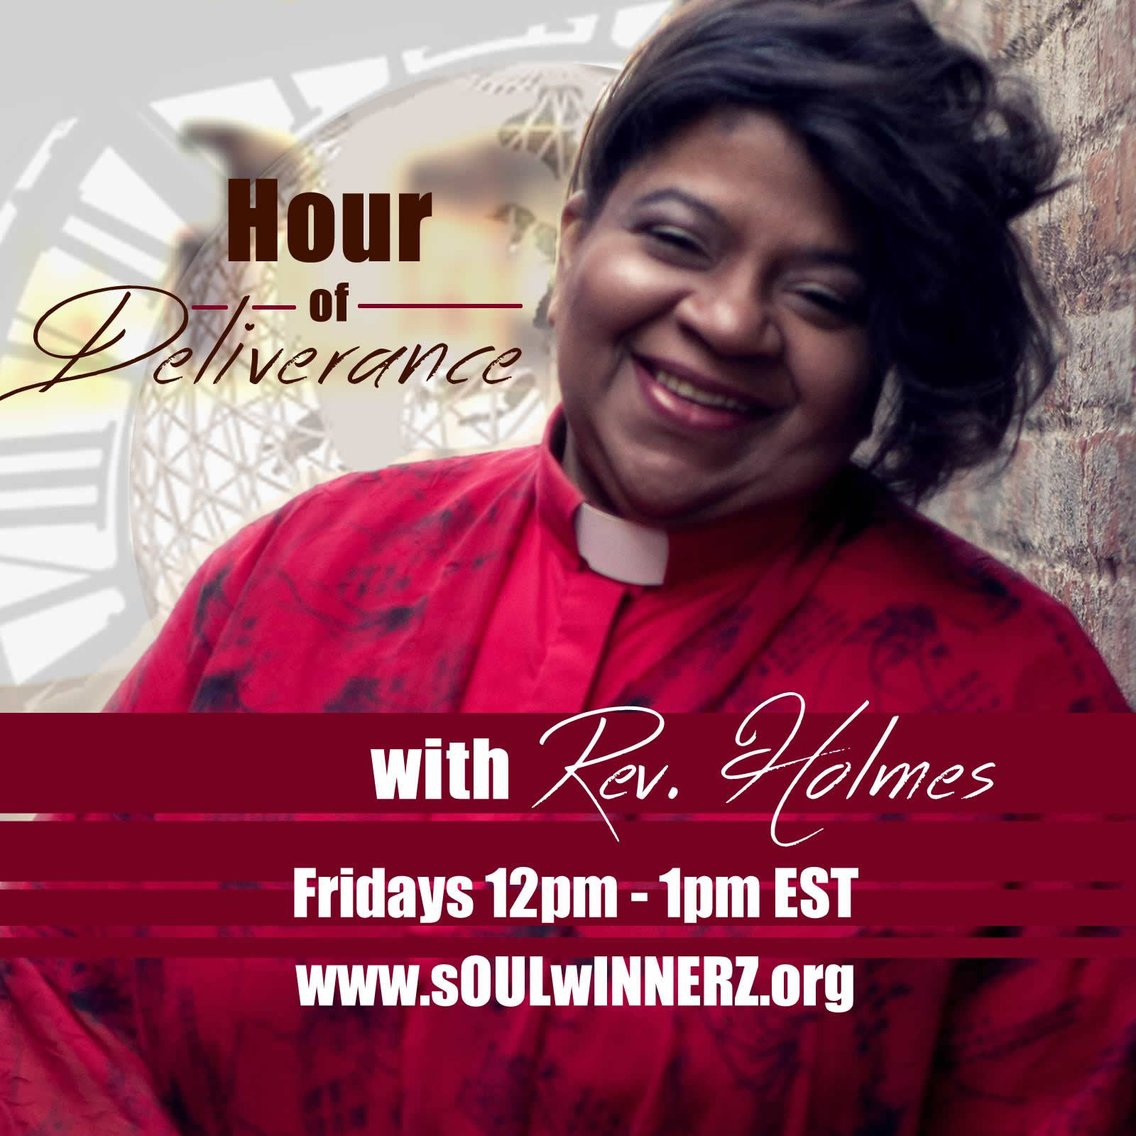 Hour of Deliverance - imagen de portada